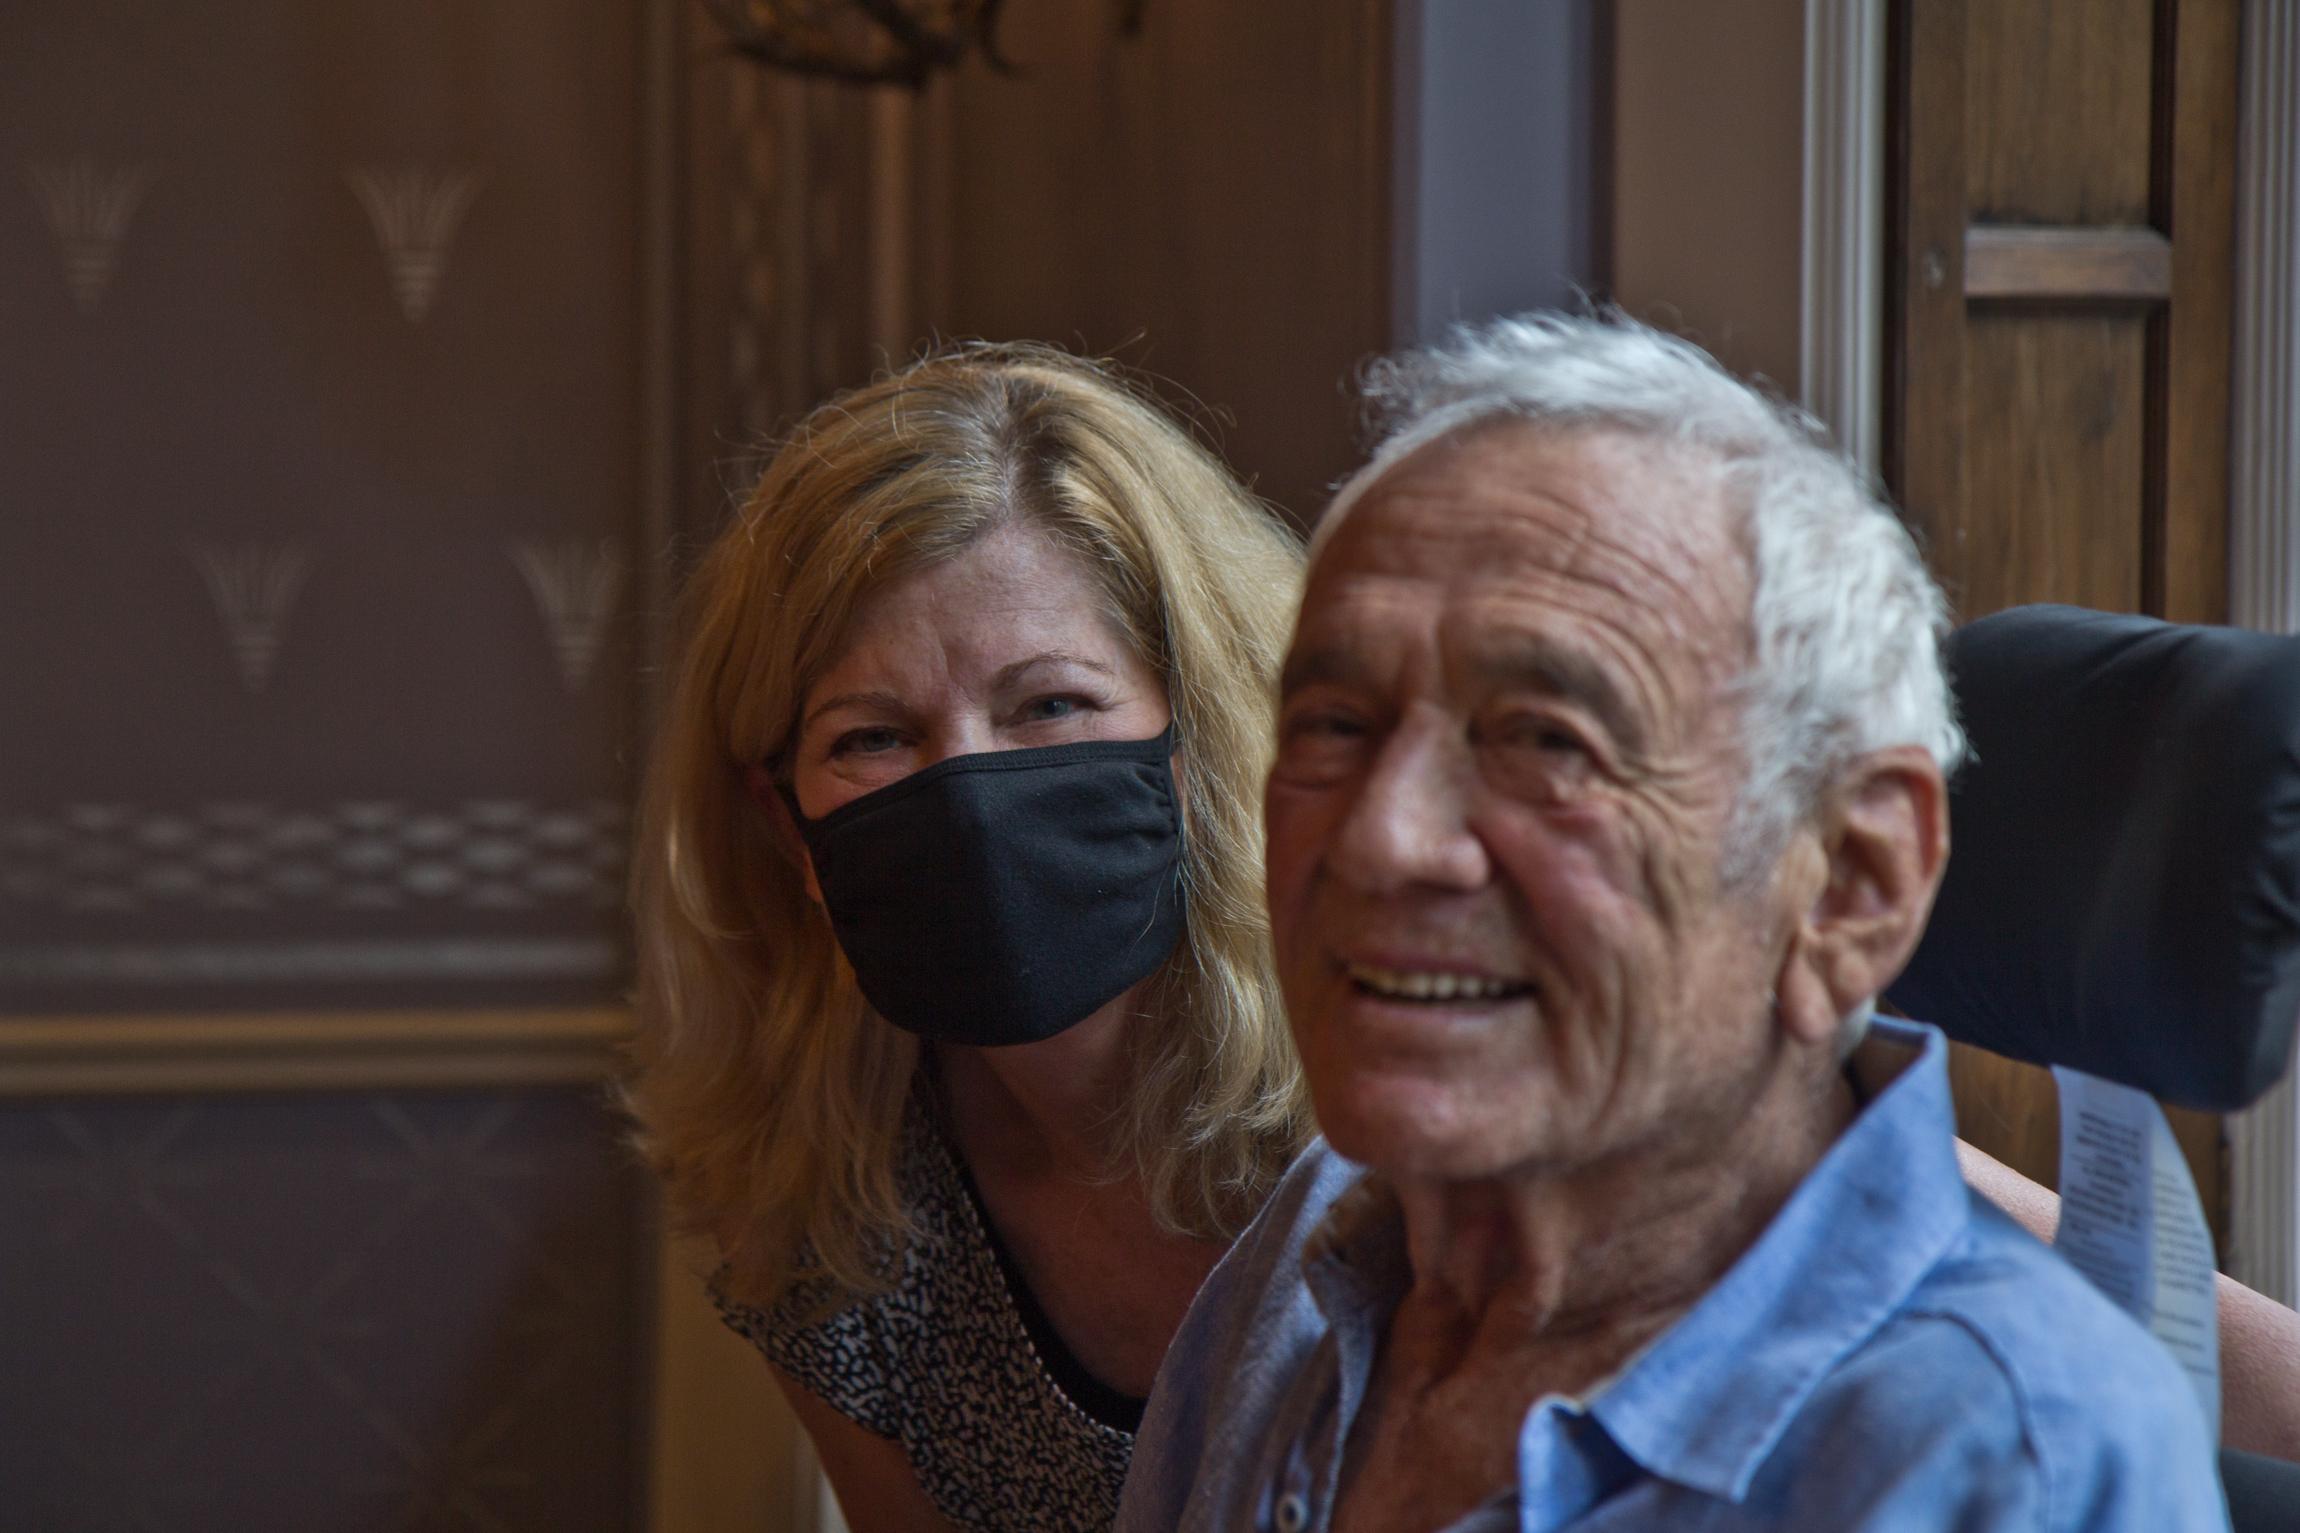 Avram Woidislawsky's doctor Vicki Bralow visits him at home